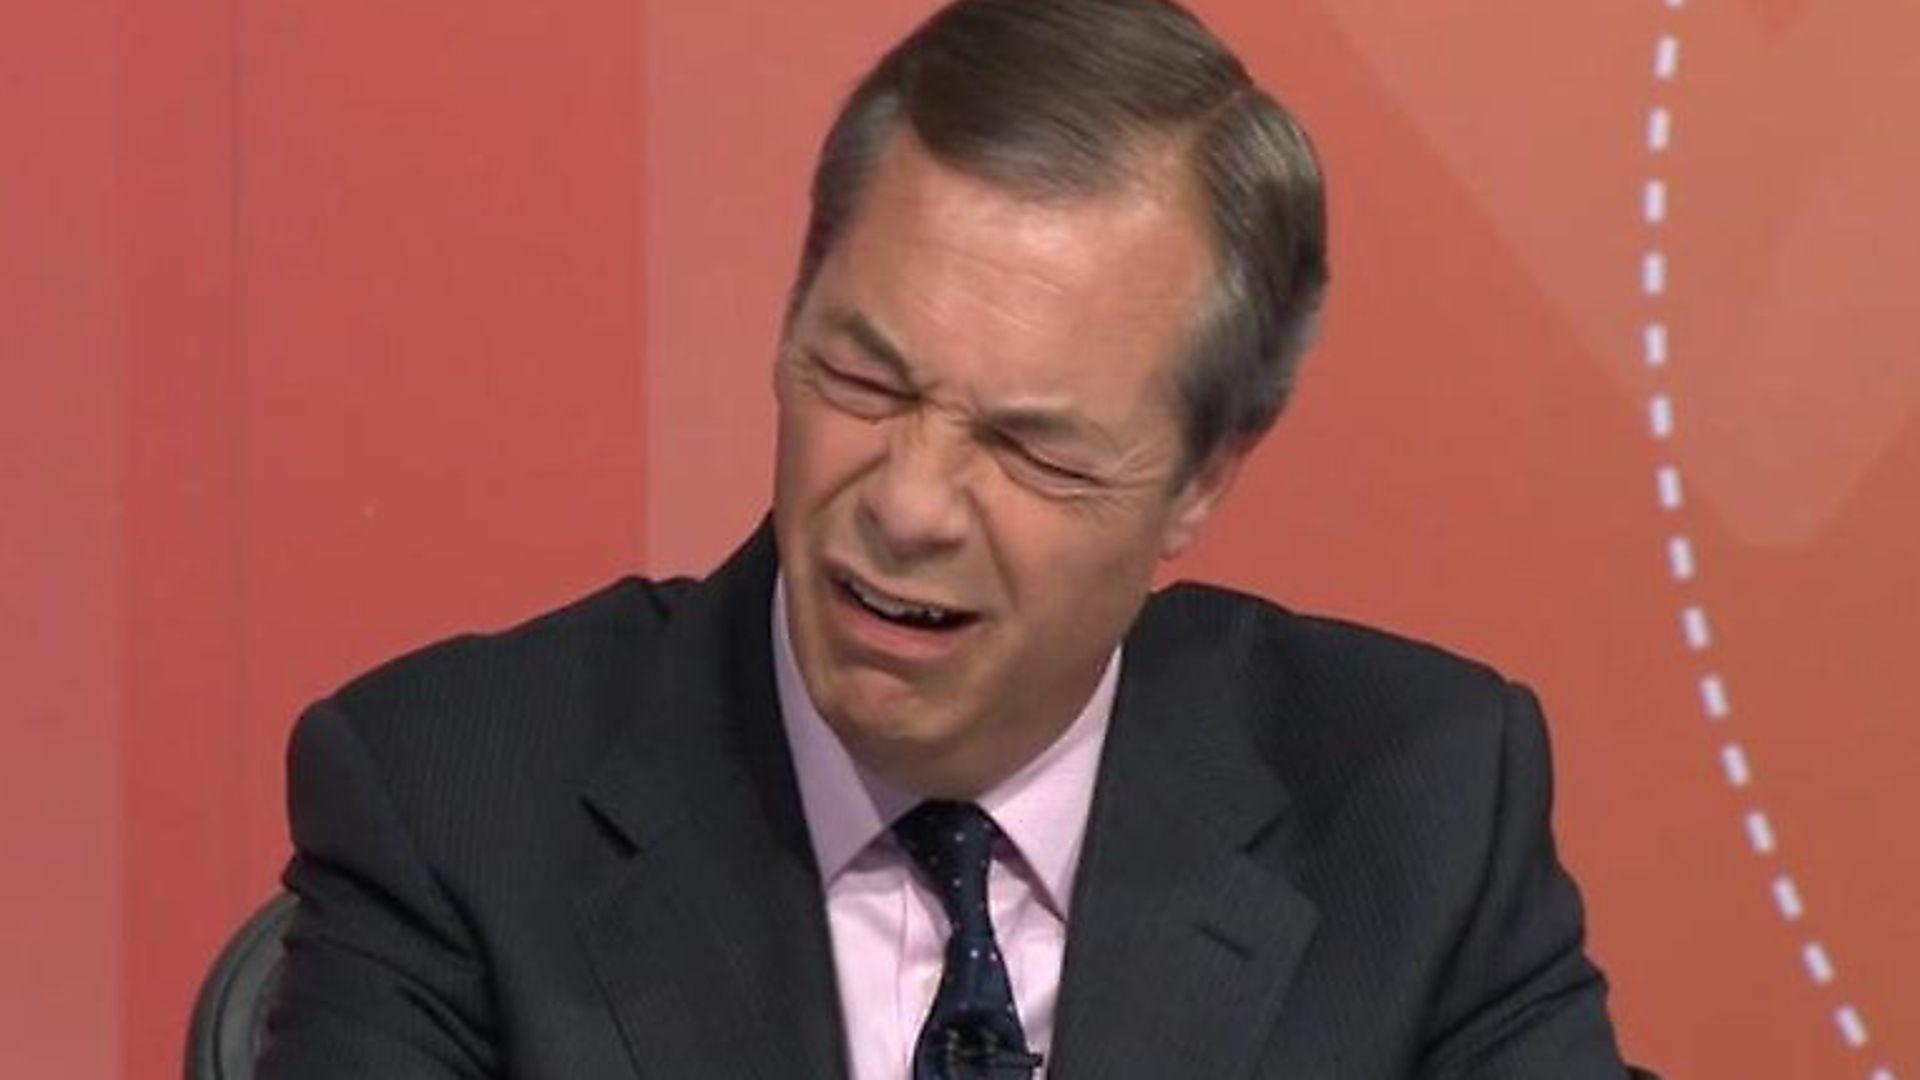 Nigel Farage. Photograph: BBC. - Credit: Archant